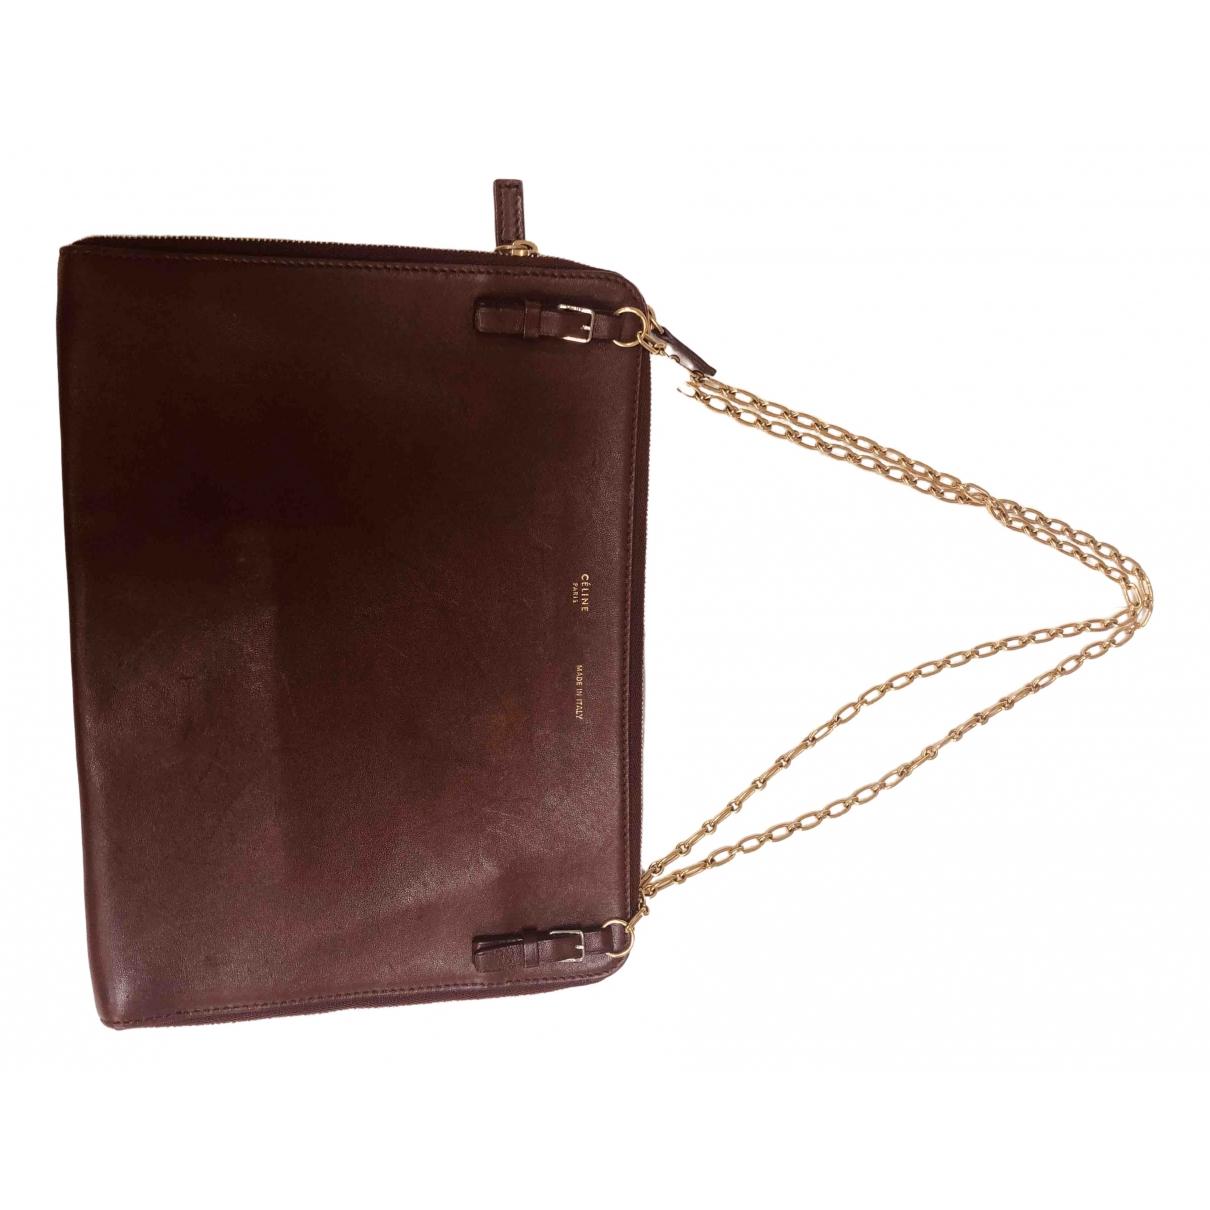 Celine All Soft Handtasche in  Bordeauxrot Leder